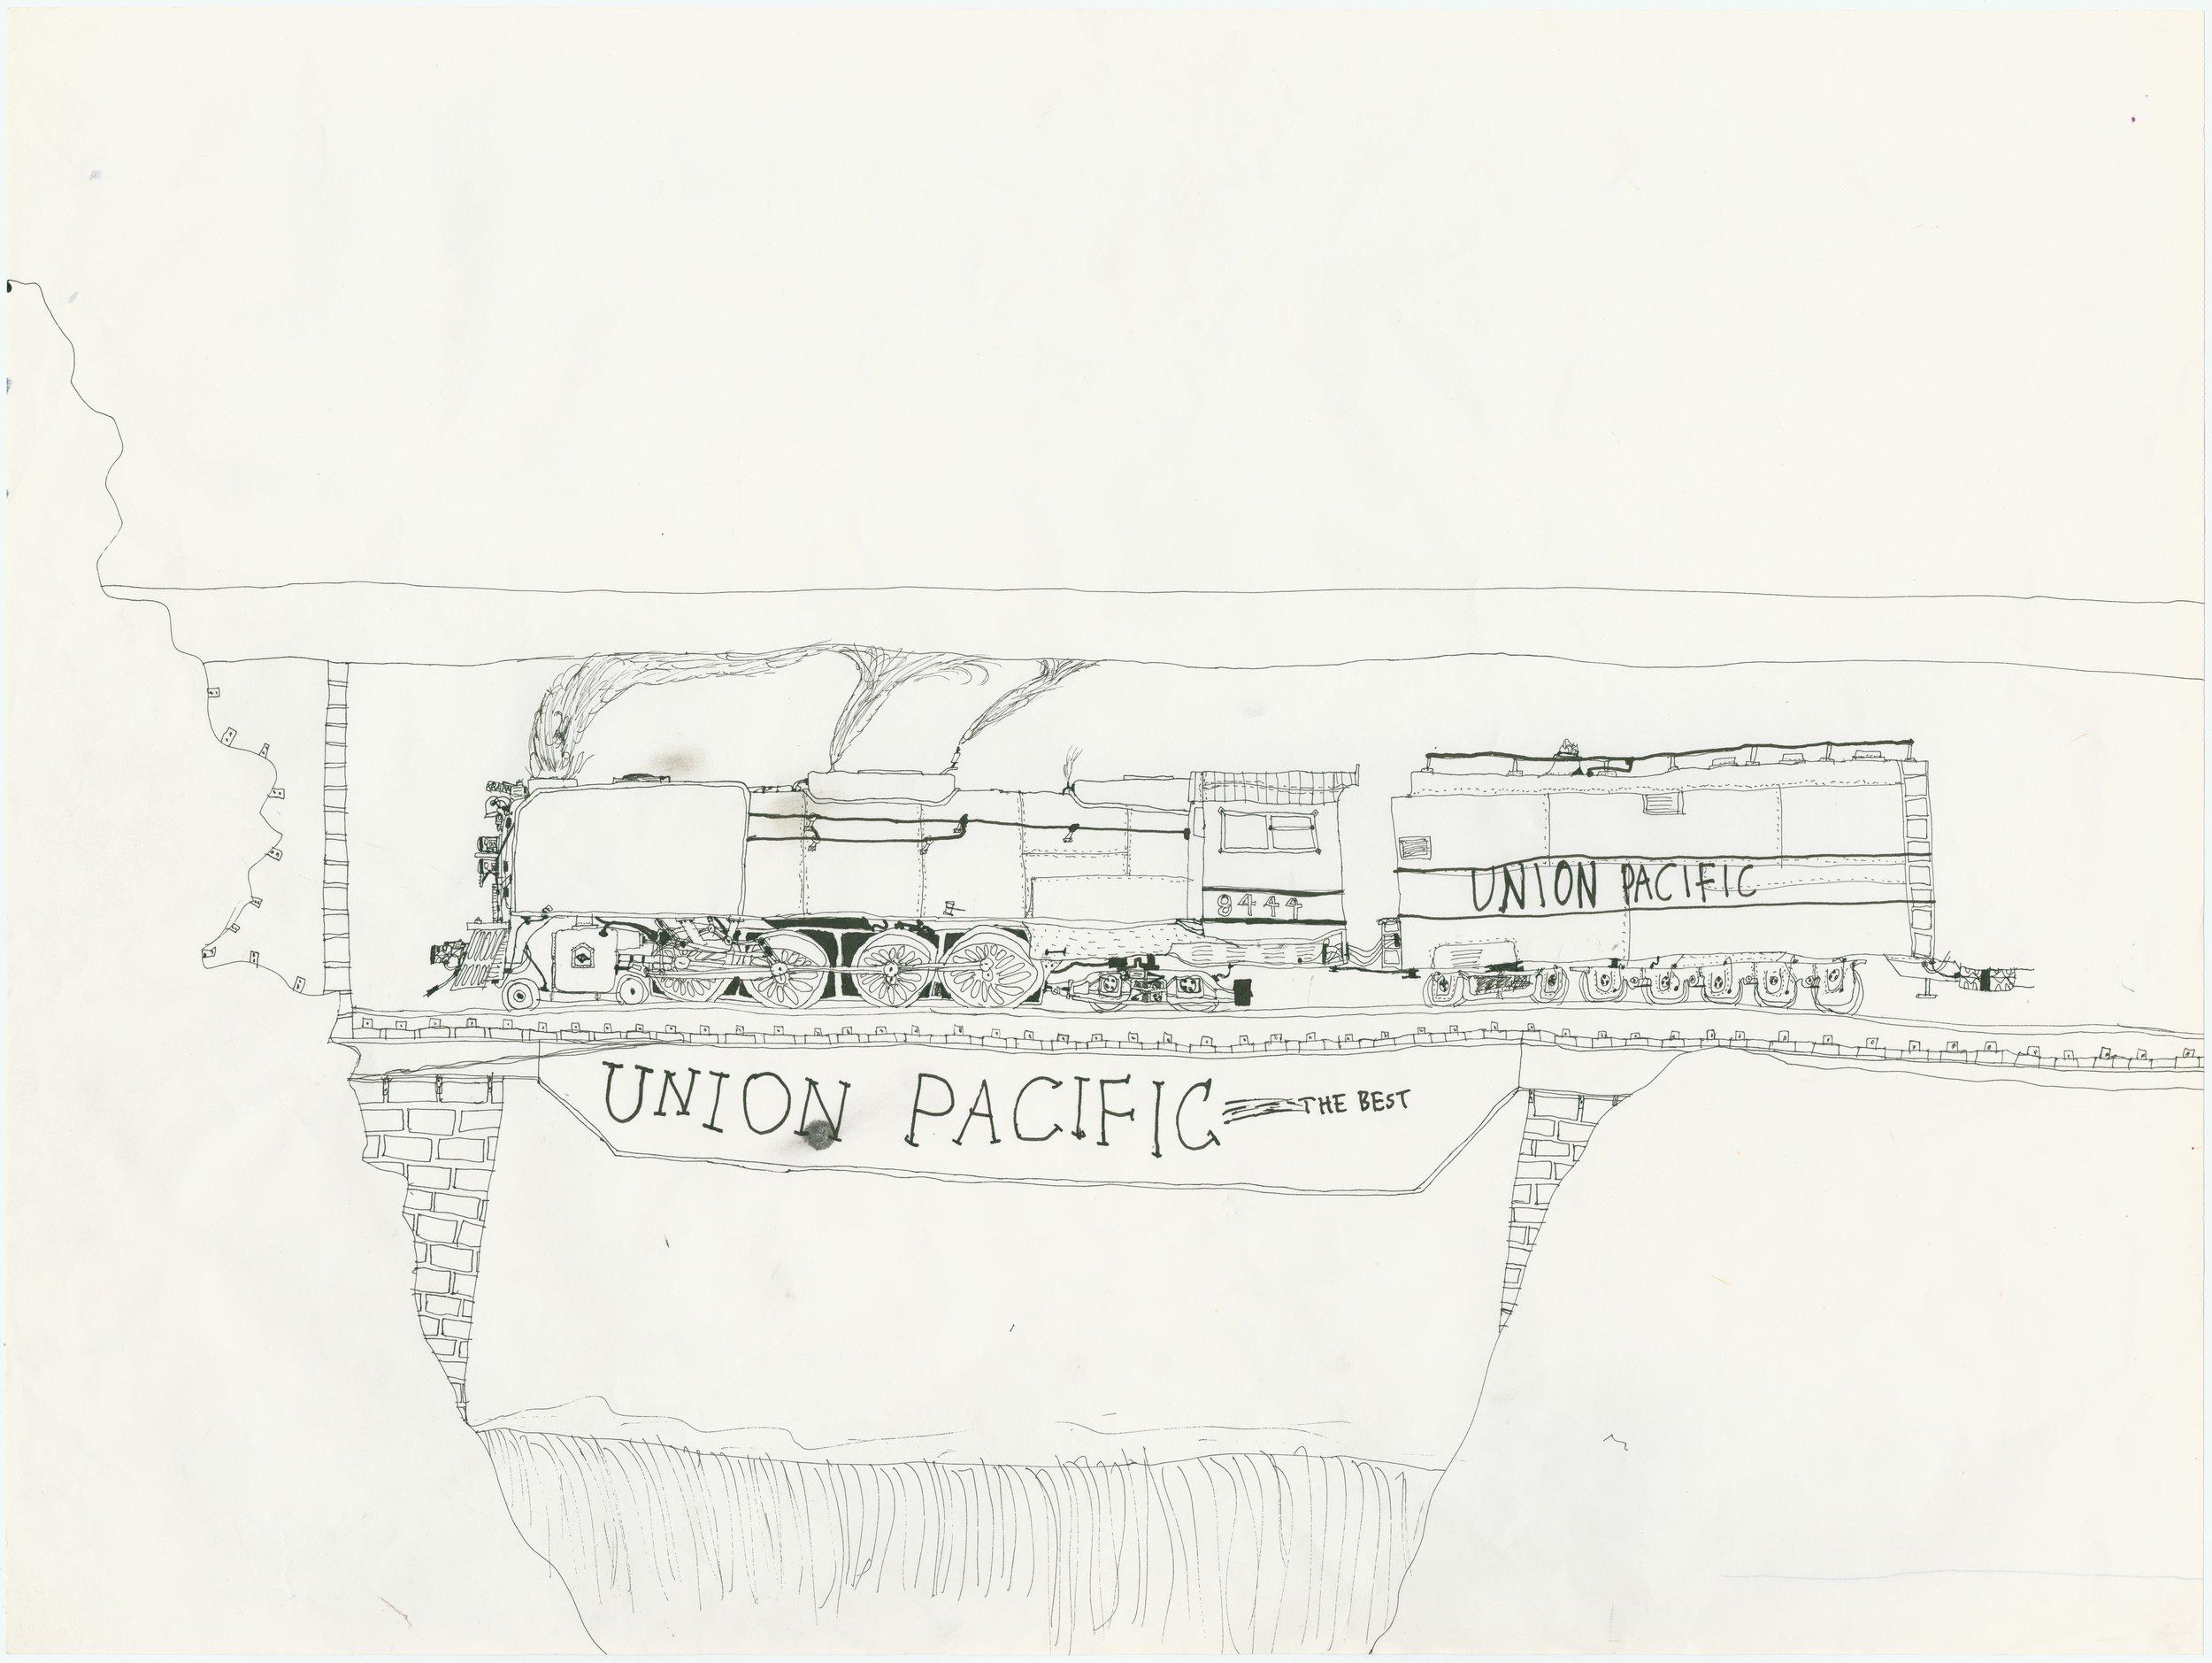 200X - 055 - Union Pacific.pdf0000.jpg